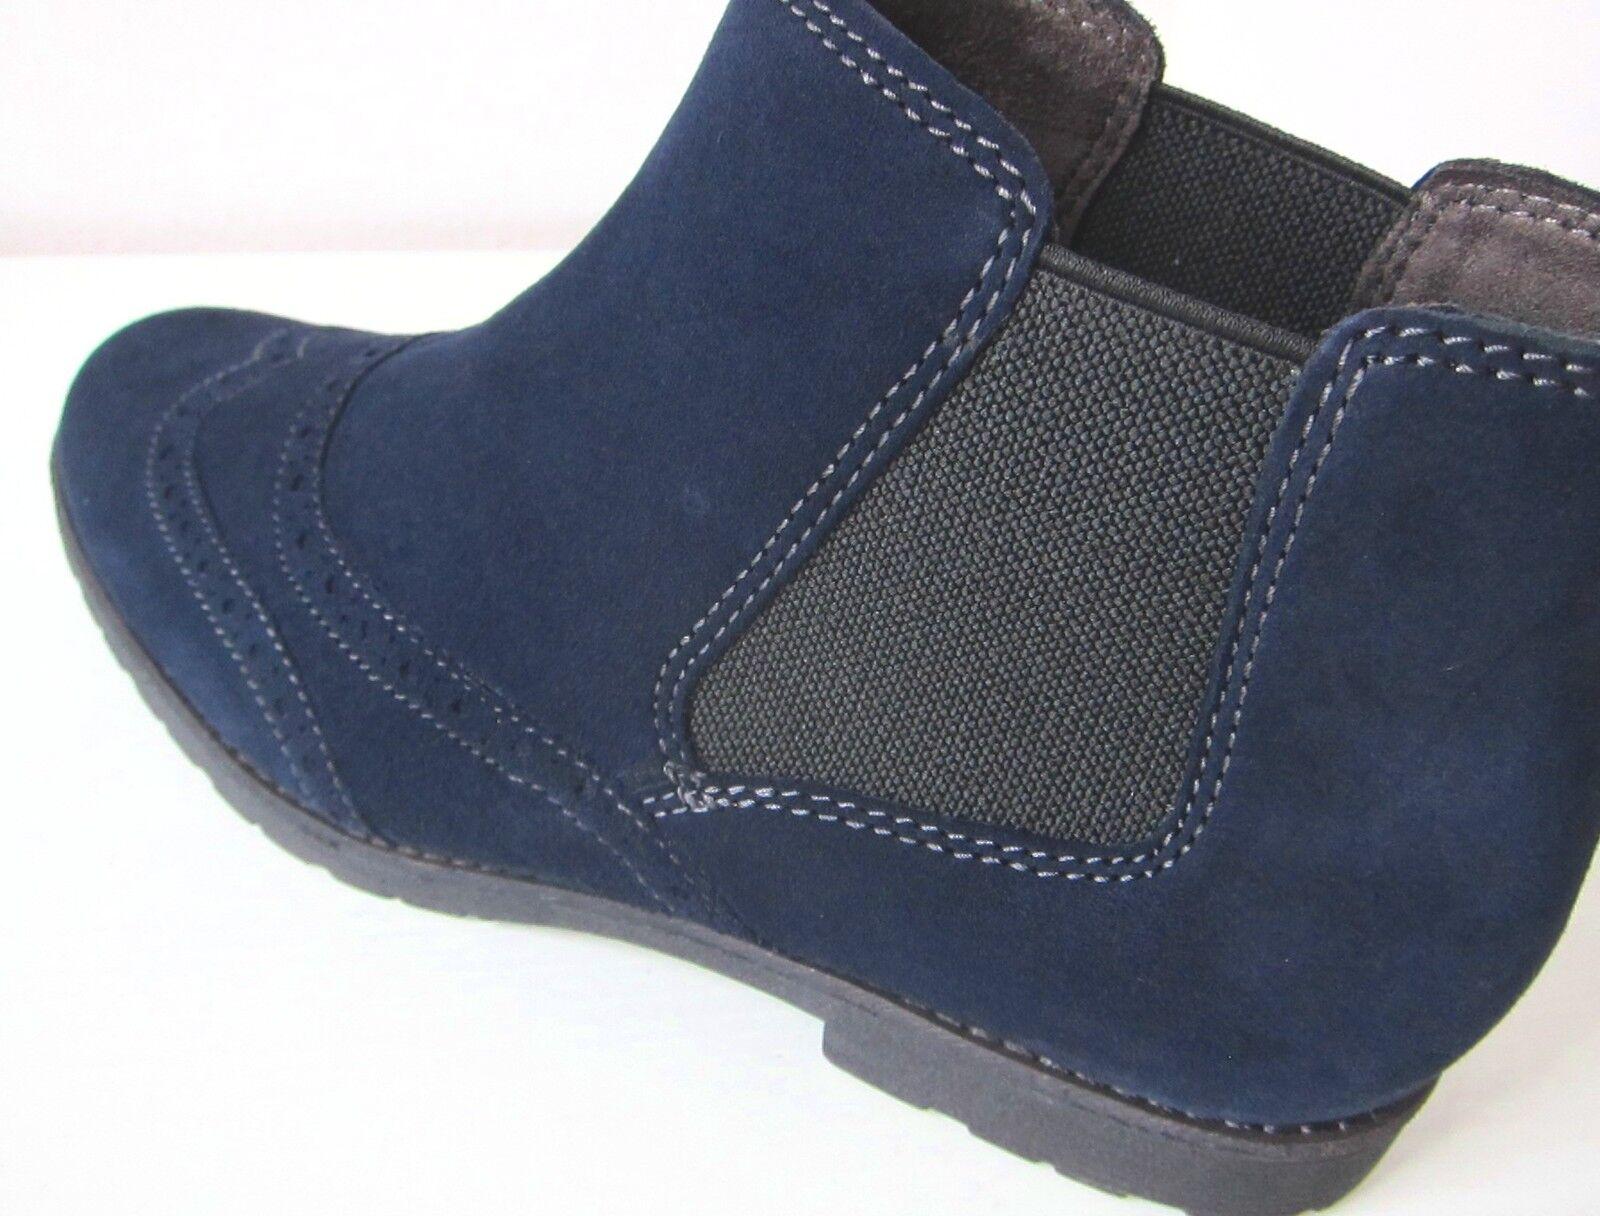 Tamaris Wildleder Stiefel Stiefelette blau Gr. 41 Blau ankle Stiefel bootee Blau 41 suede 1f3b51